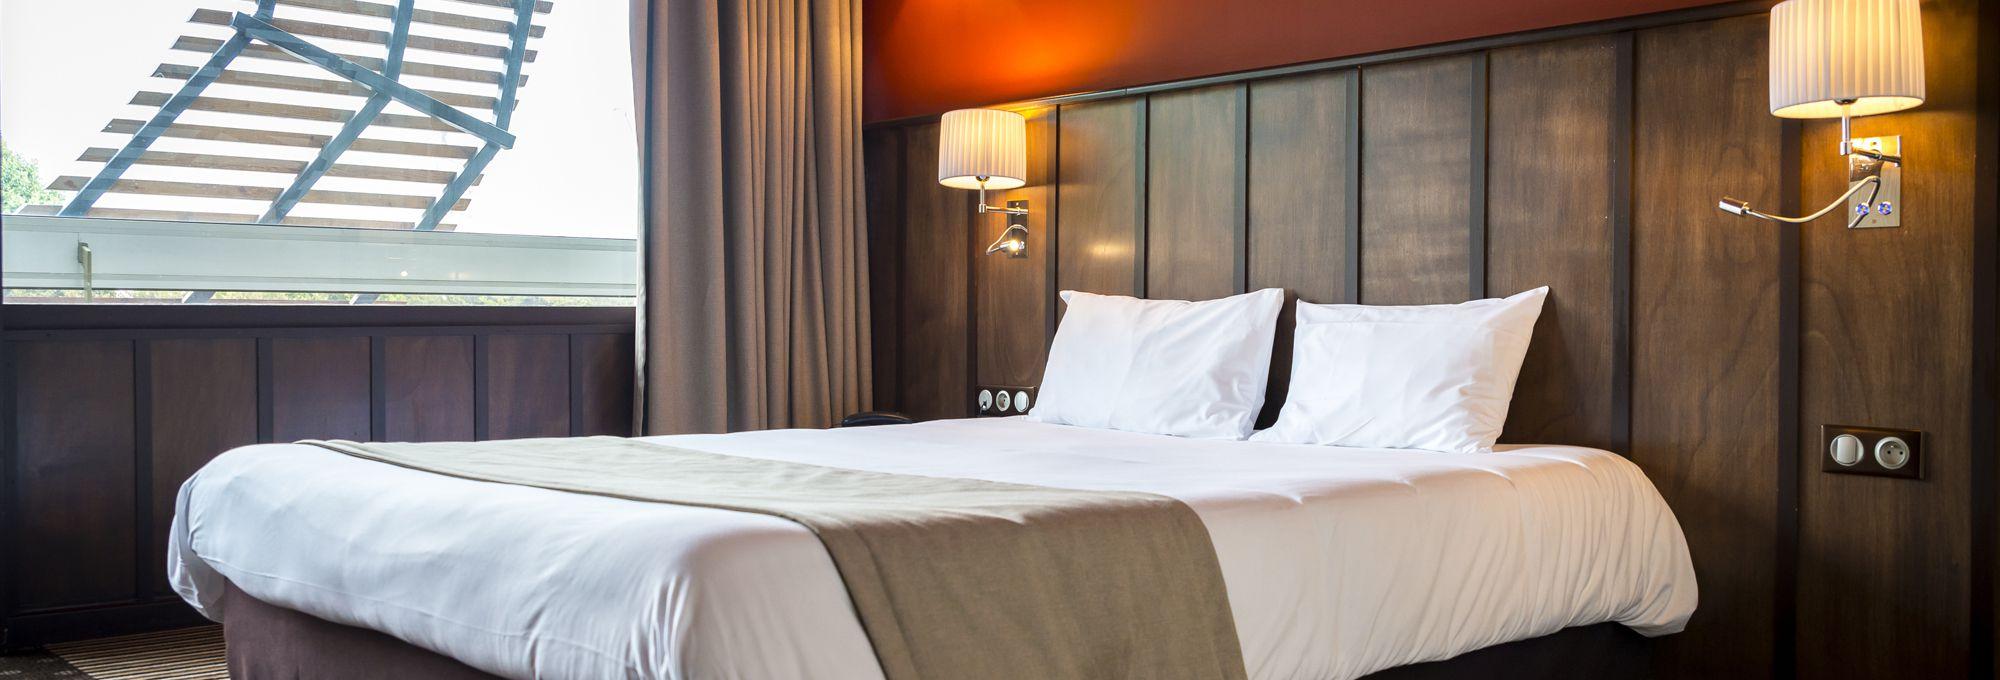 Brit Hotel Saint-Brieuc